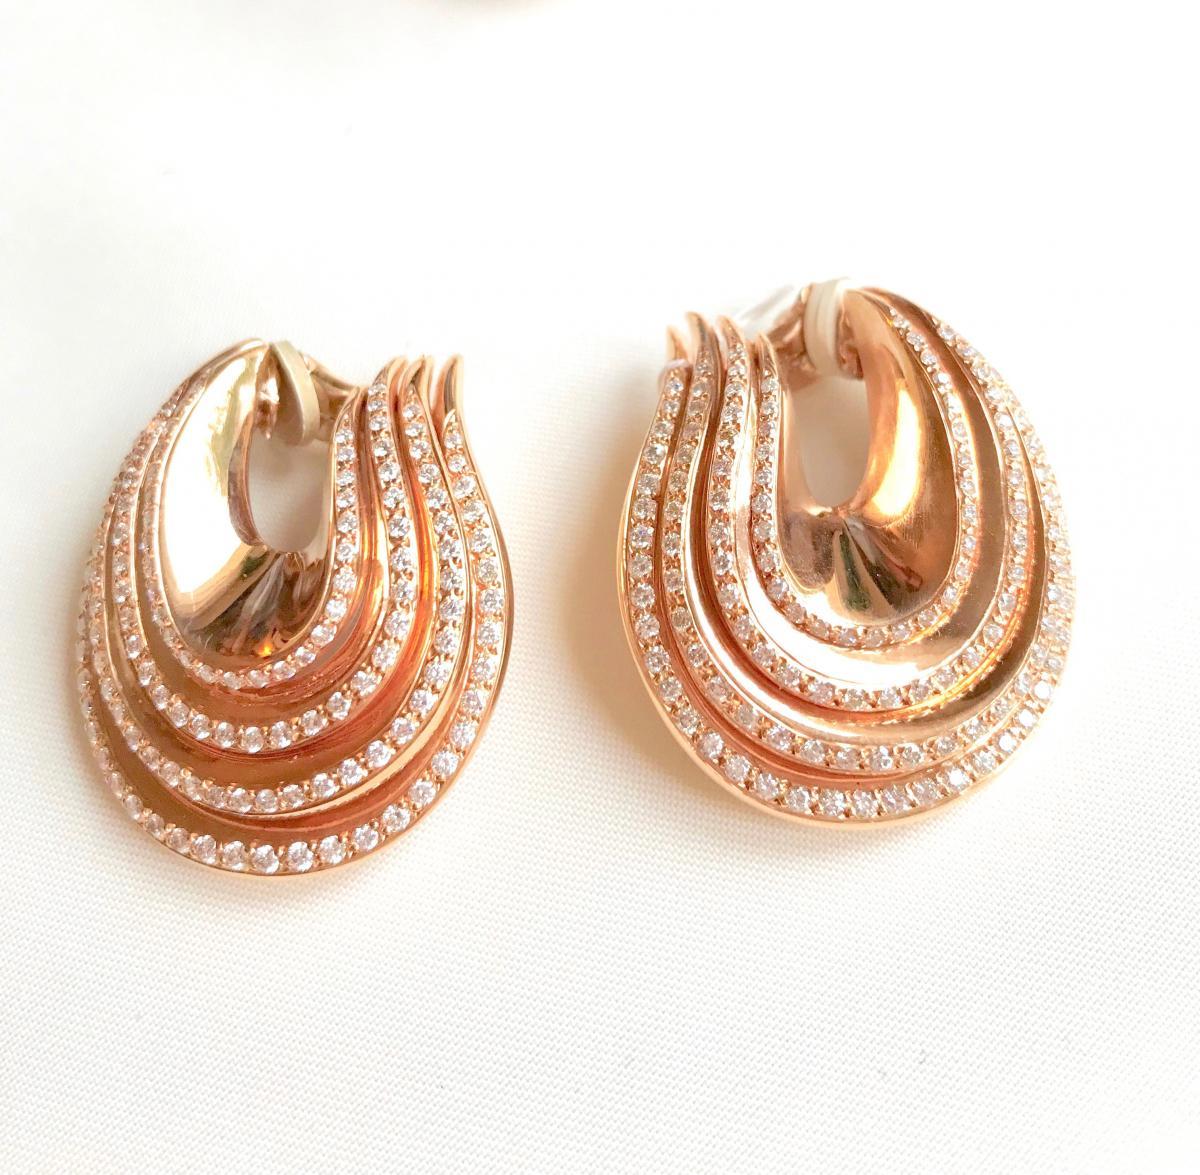 De Grisogono Set, Pink Gold And Diamonds, Shape 4 Twisted Rings-photo-2